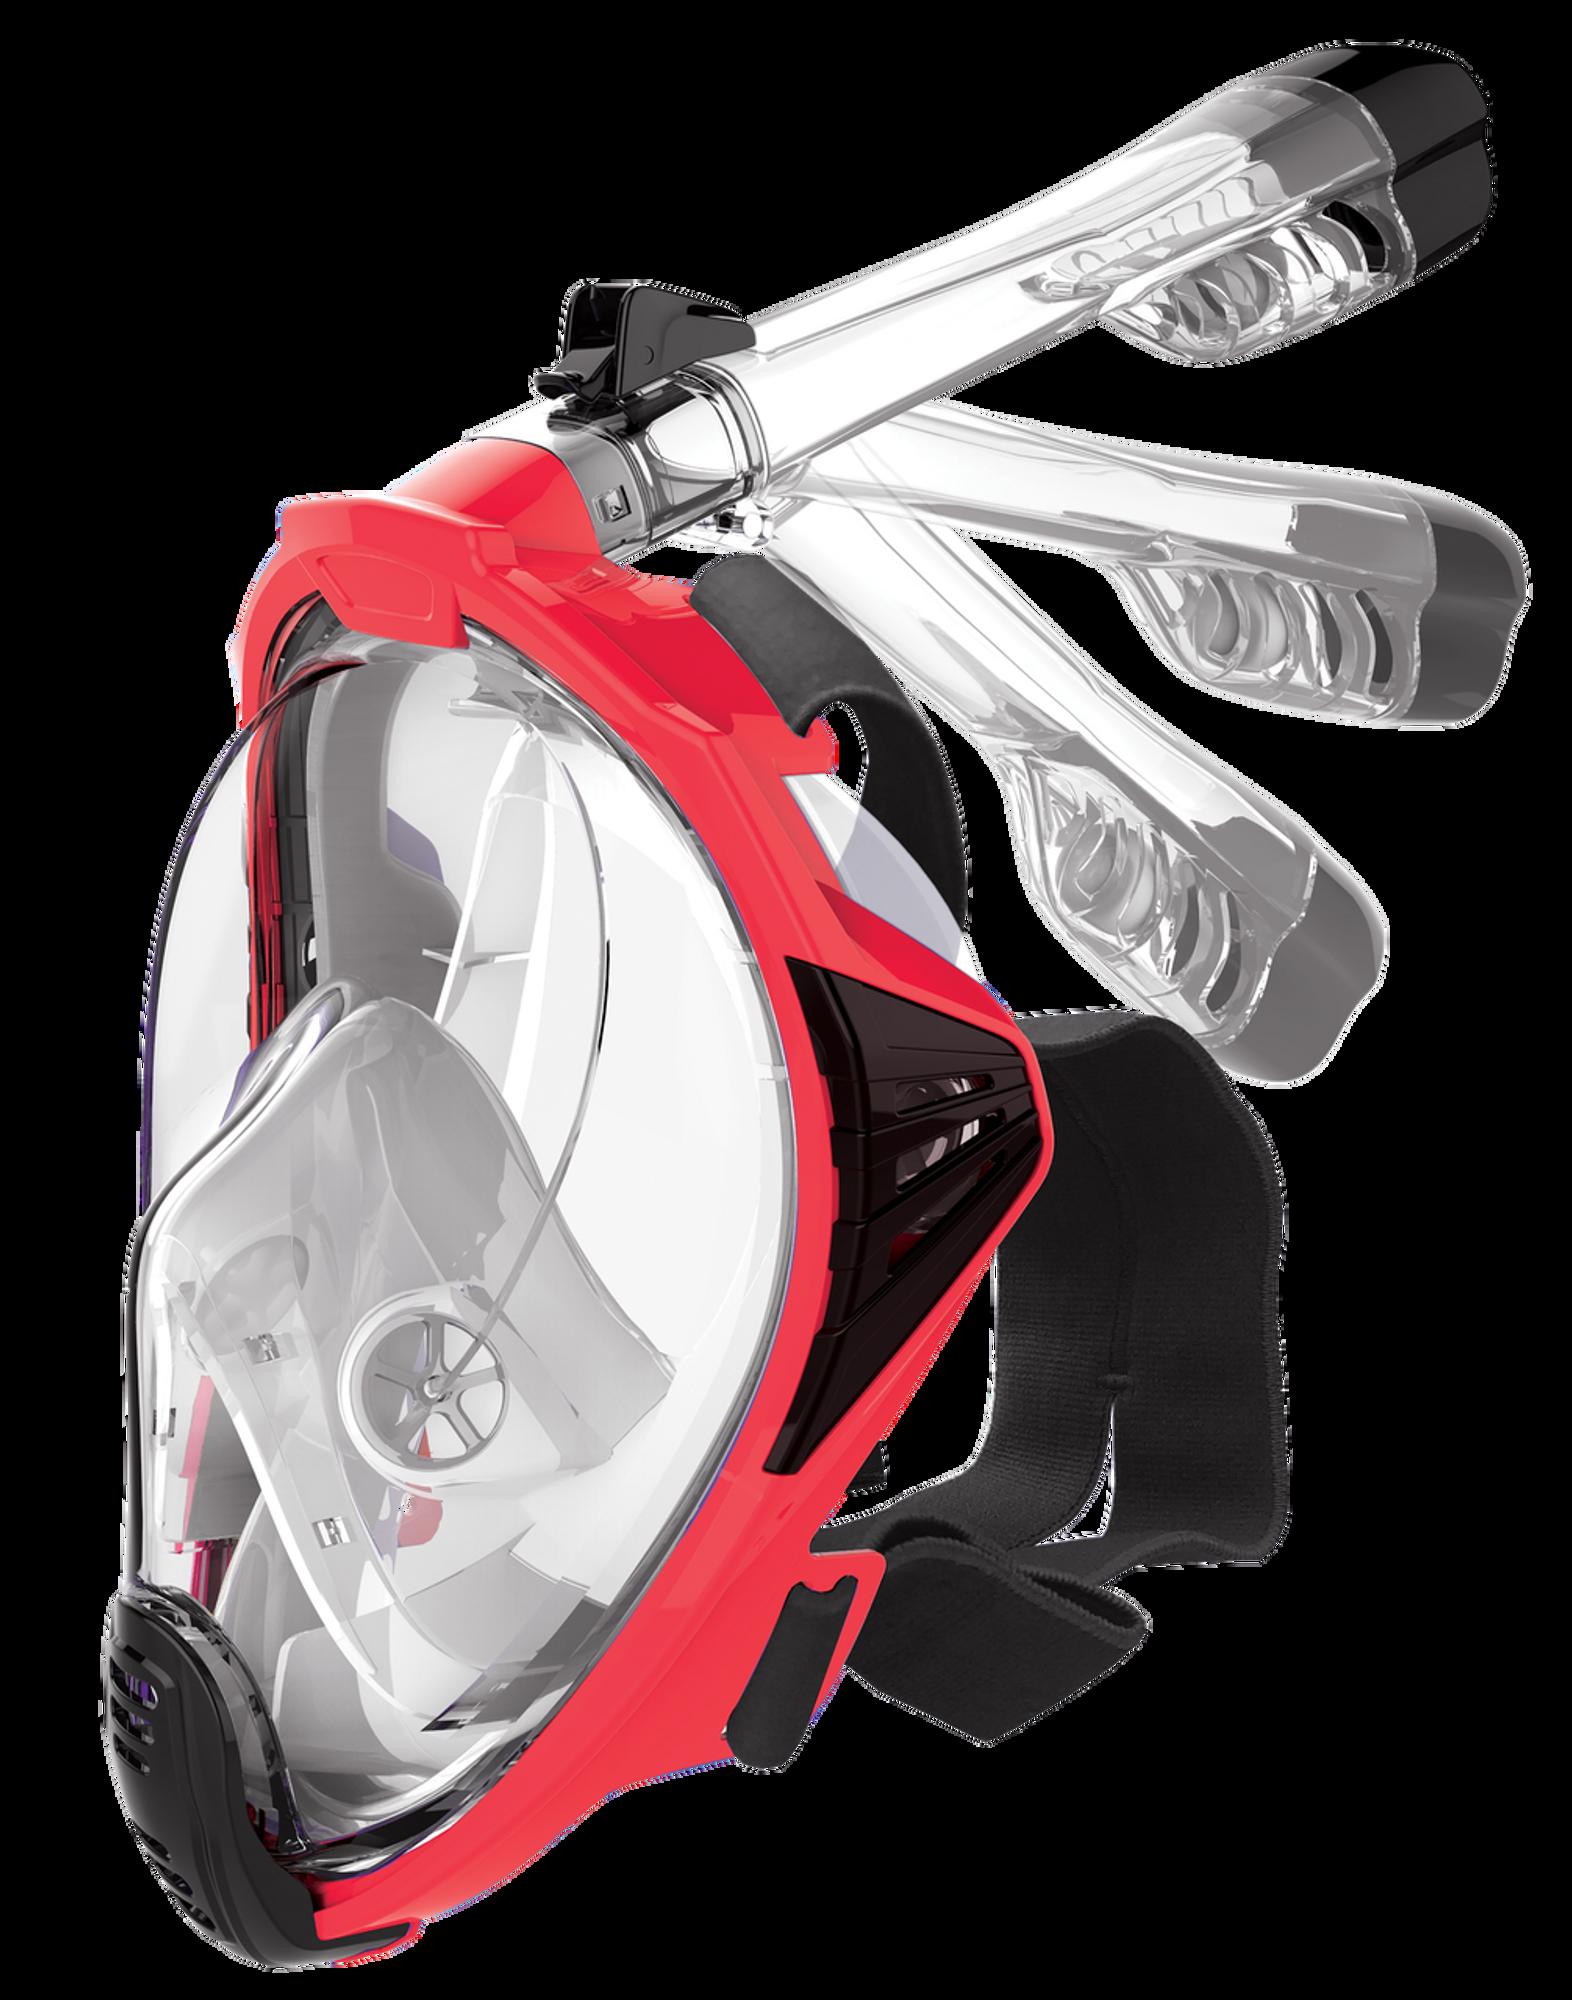 Vue Tech - Adult Snorkeling Set